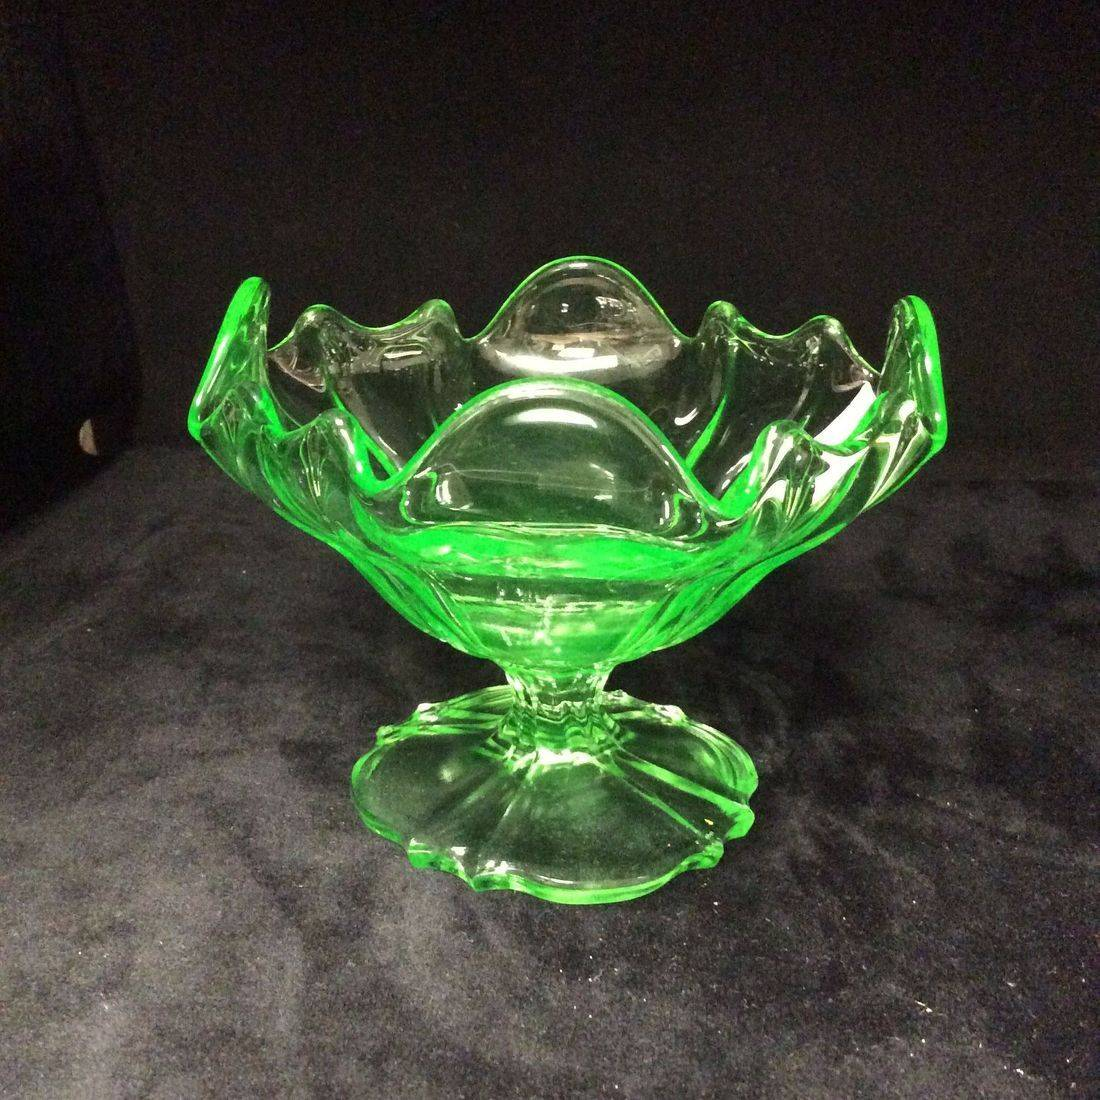 "Early Green Uranium Glass Ruffled Pedestal Candy/ Nut Dish  4-1/4""H x 5-7/8"" W.  $35.00"